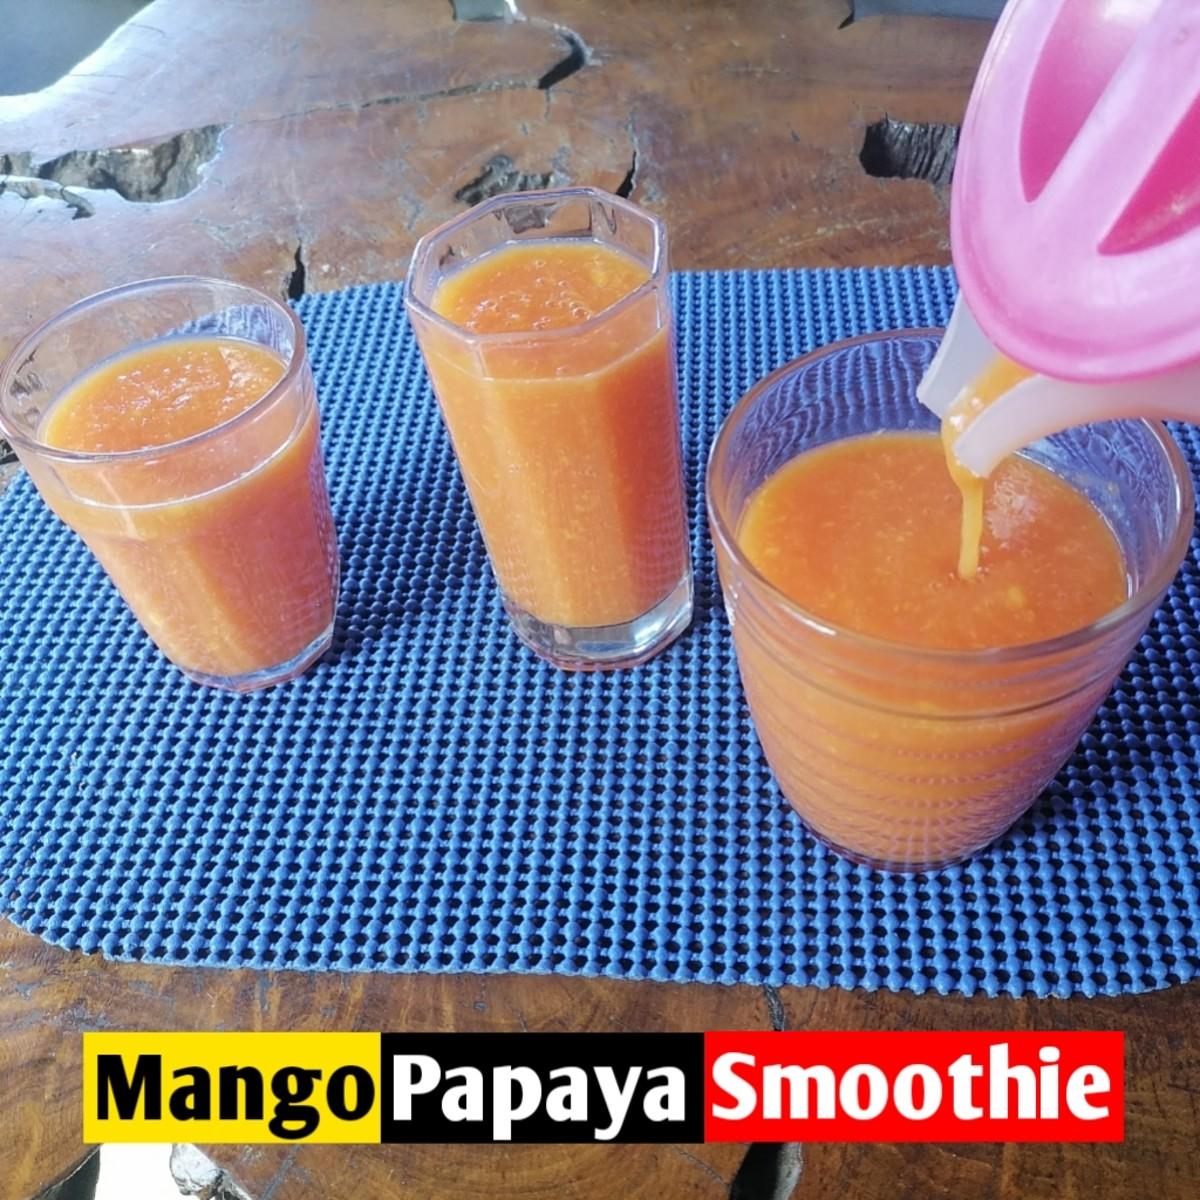 Mango papaya smoothies are so refreshing and tasty